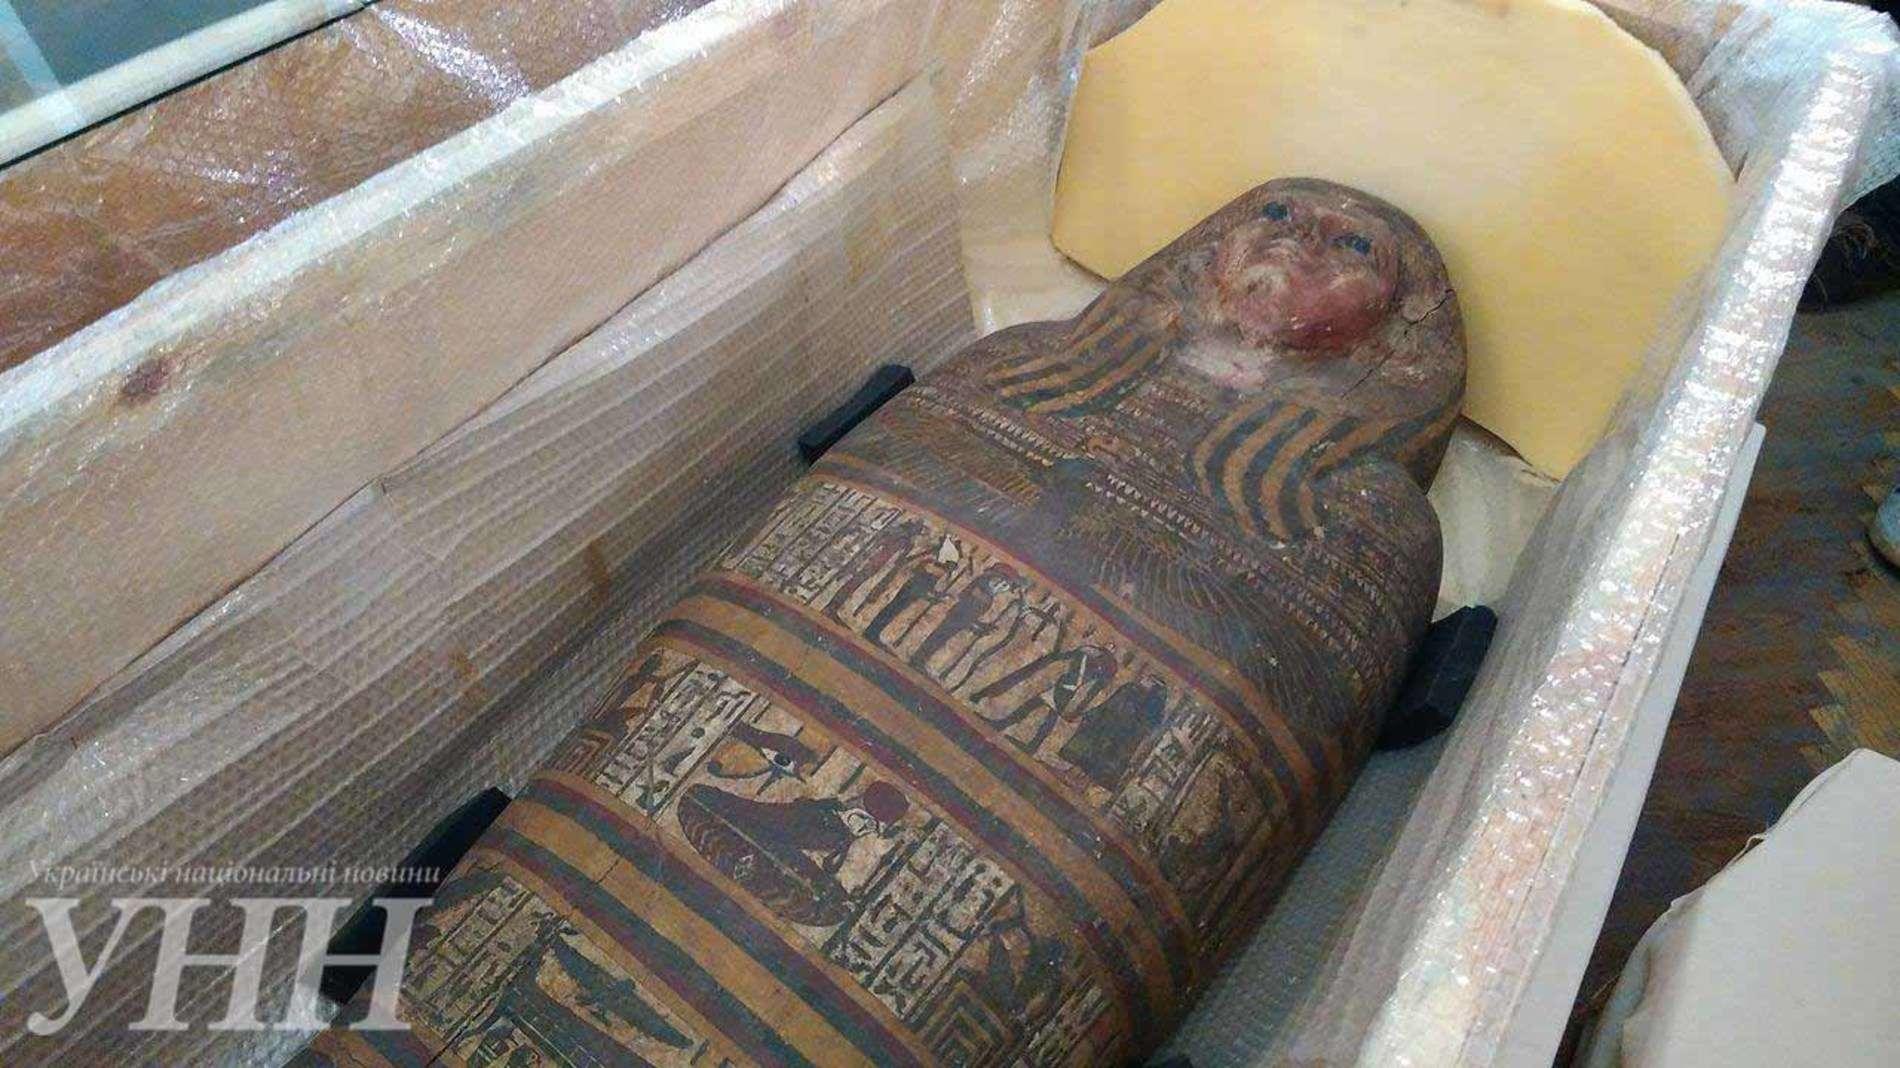 Києво-Печерська лавра показала знайдену давньоєгипетську мумію